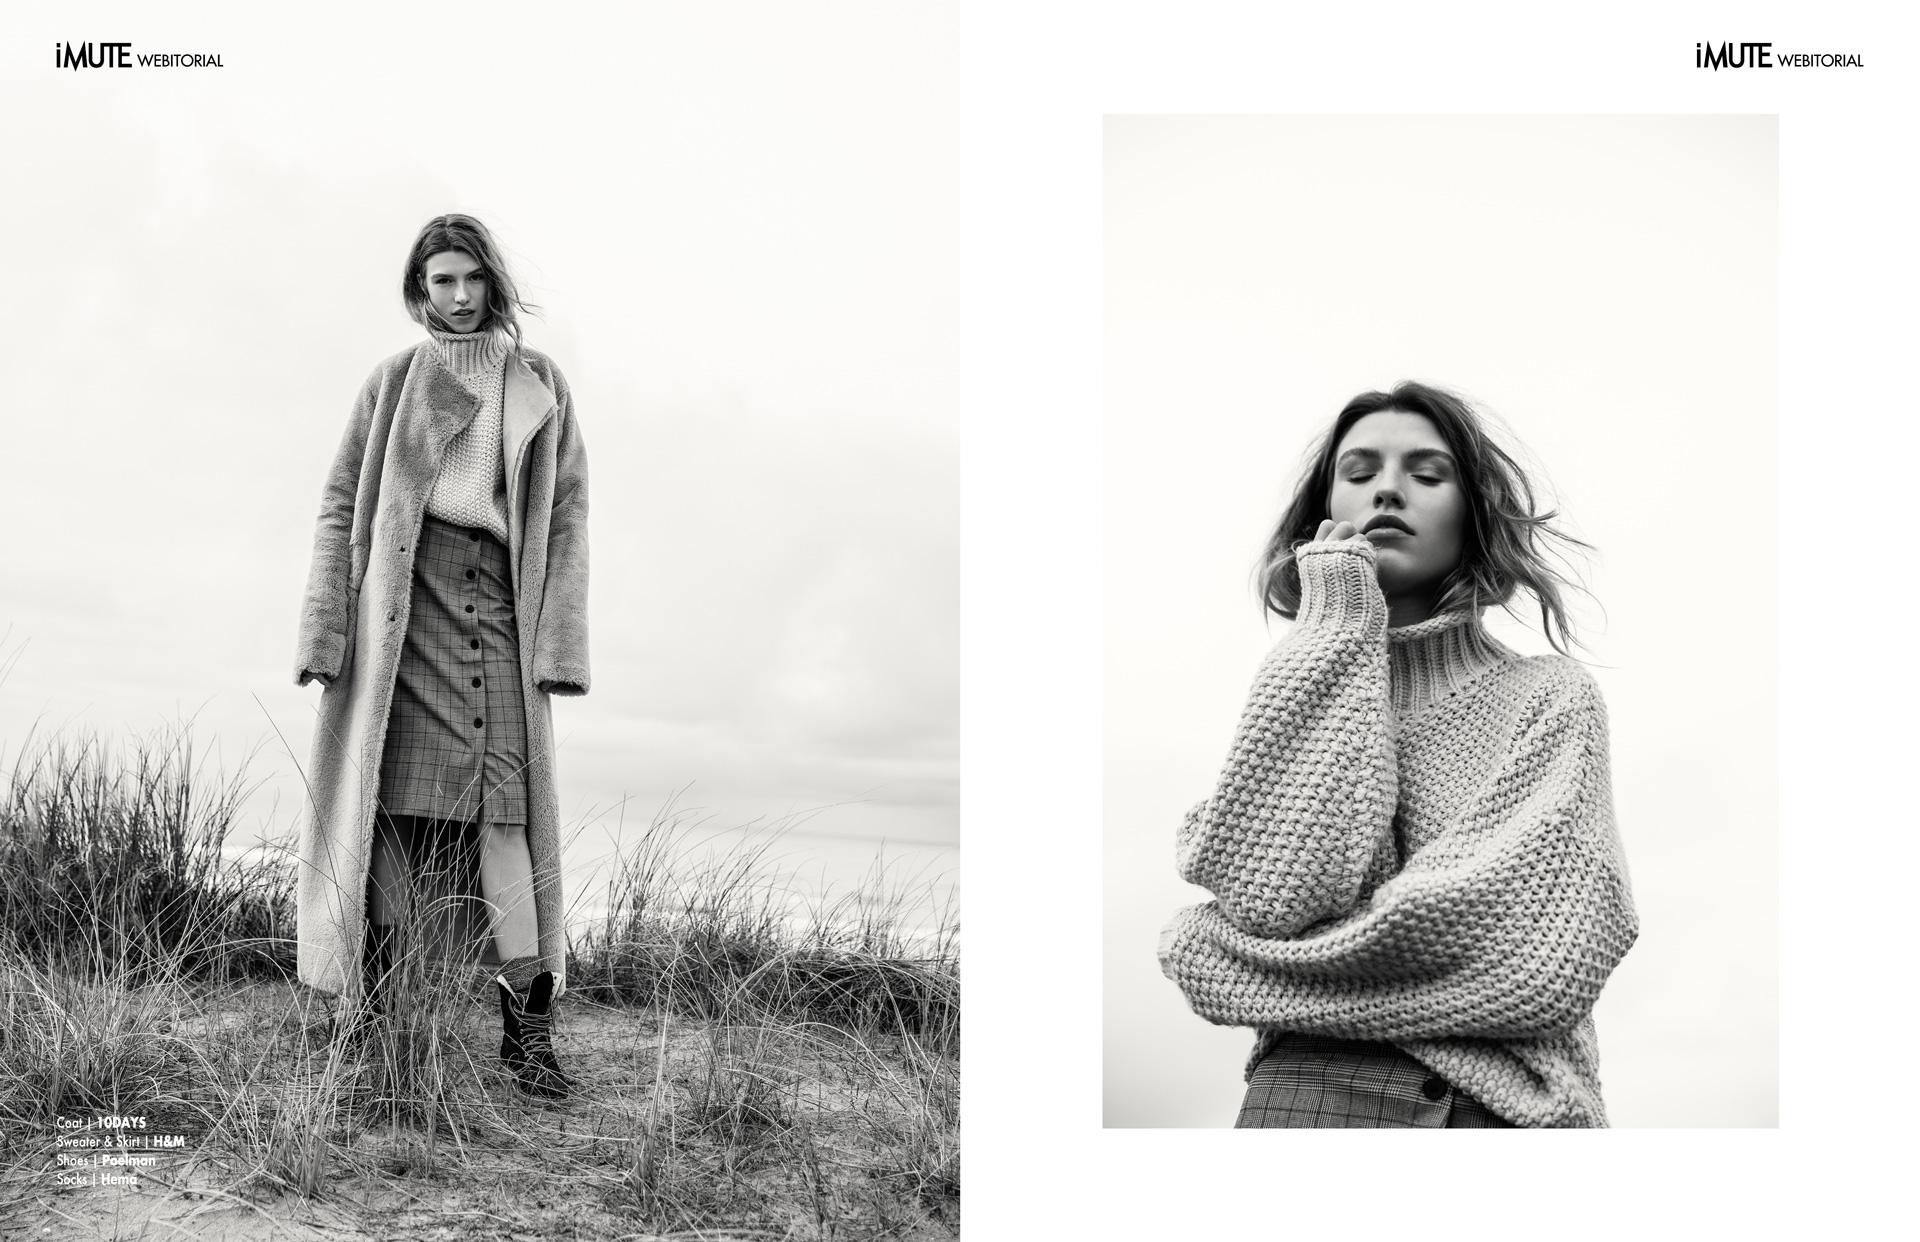 Sea me webitorial for iMute Magazine Photographer|Jaap Strijker Model| Eva Korsten @De Boekers Stylist|Ilse Elkerbout Makeup & Hair|Mimi Stobbe